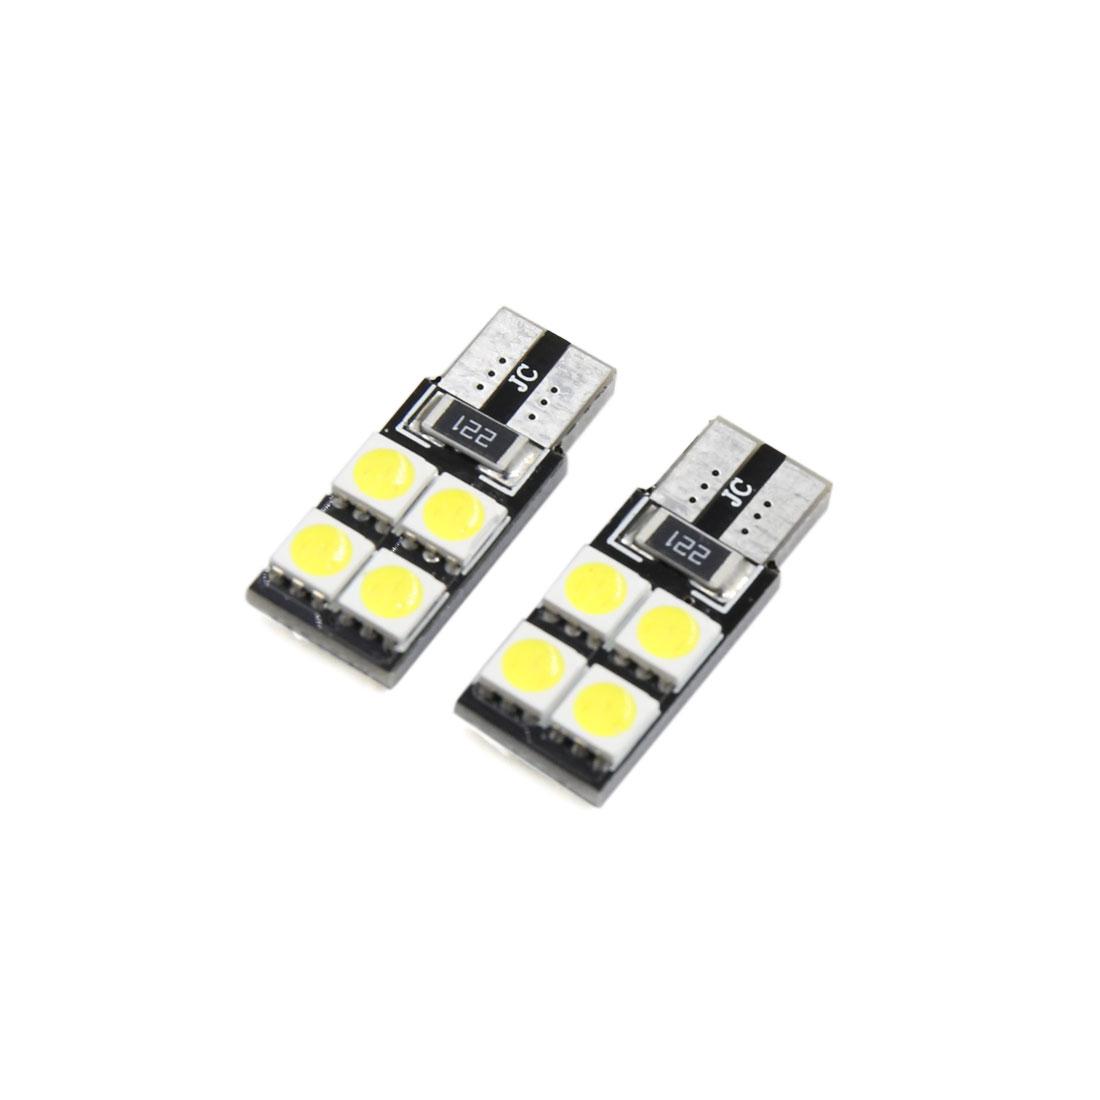 2Pcs T10 4W 4-5050-SMD White LED Car Panel Light Lamp Interior W5W 194 168